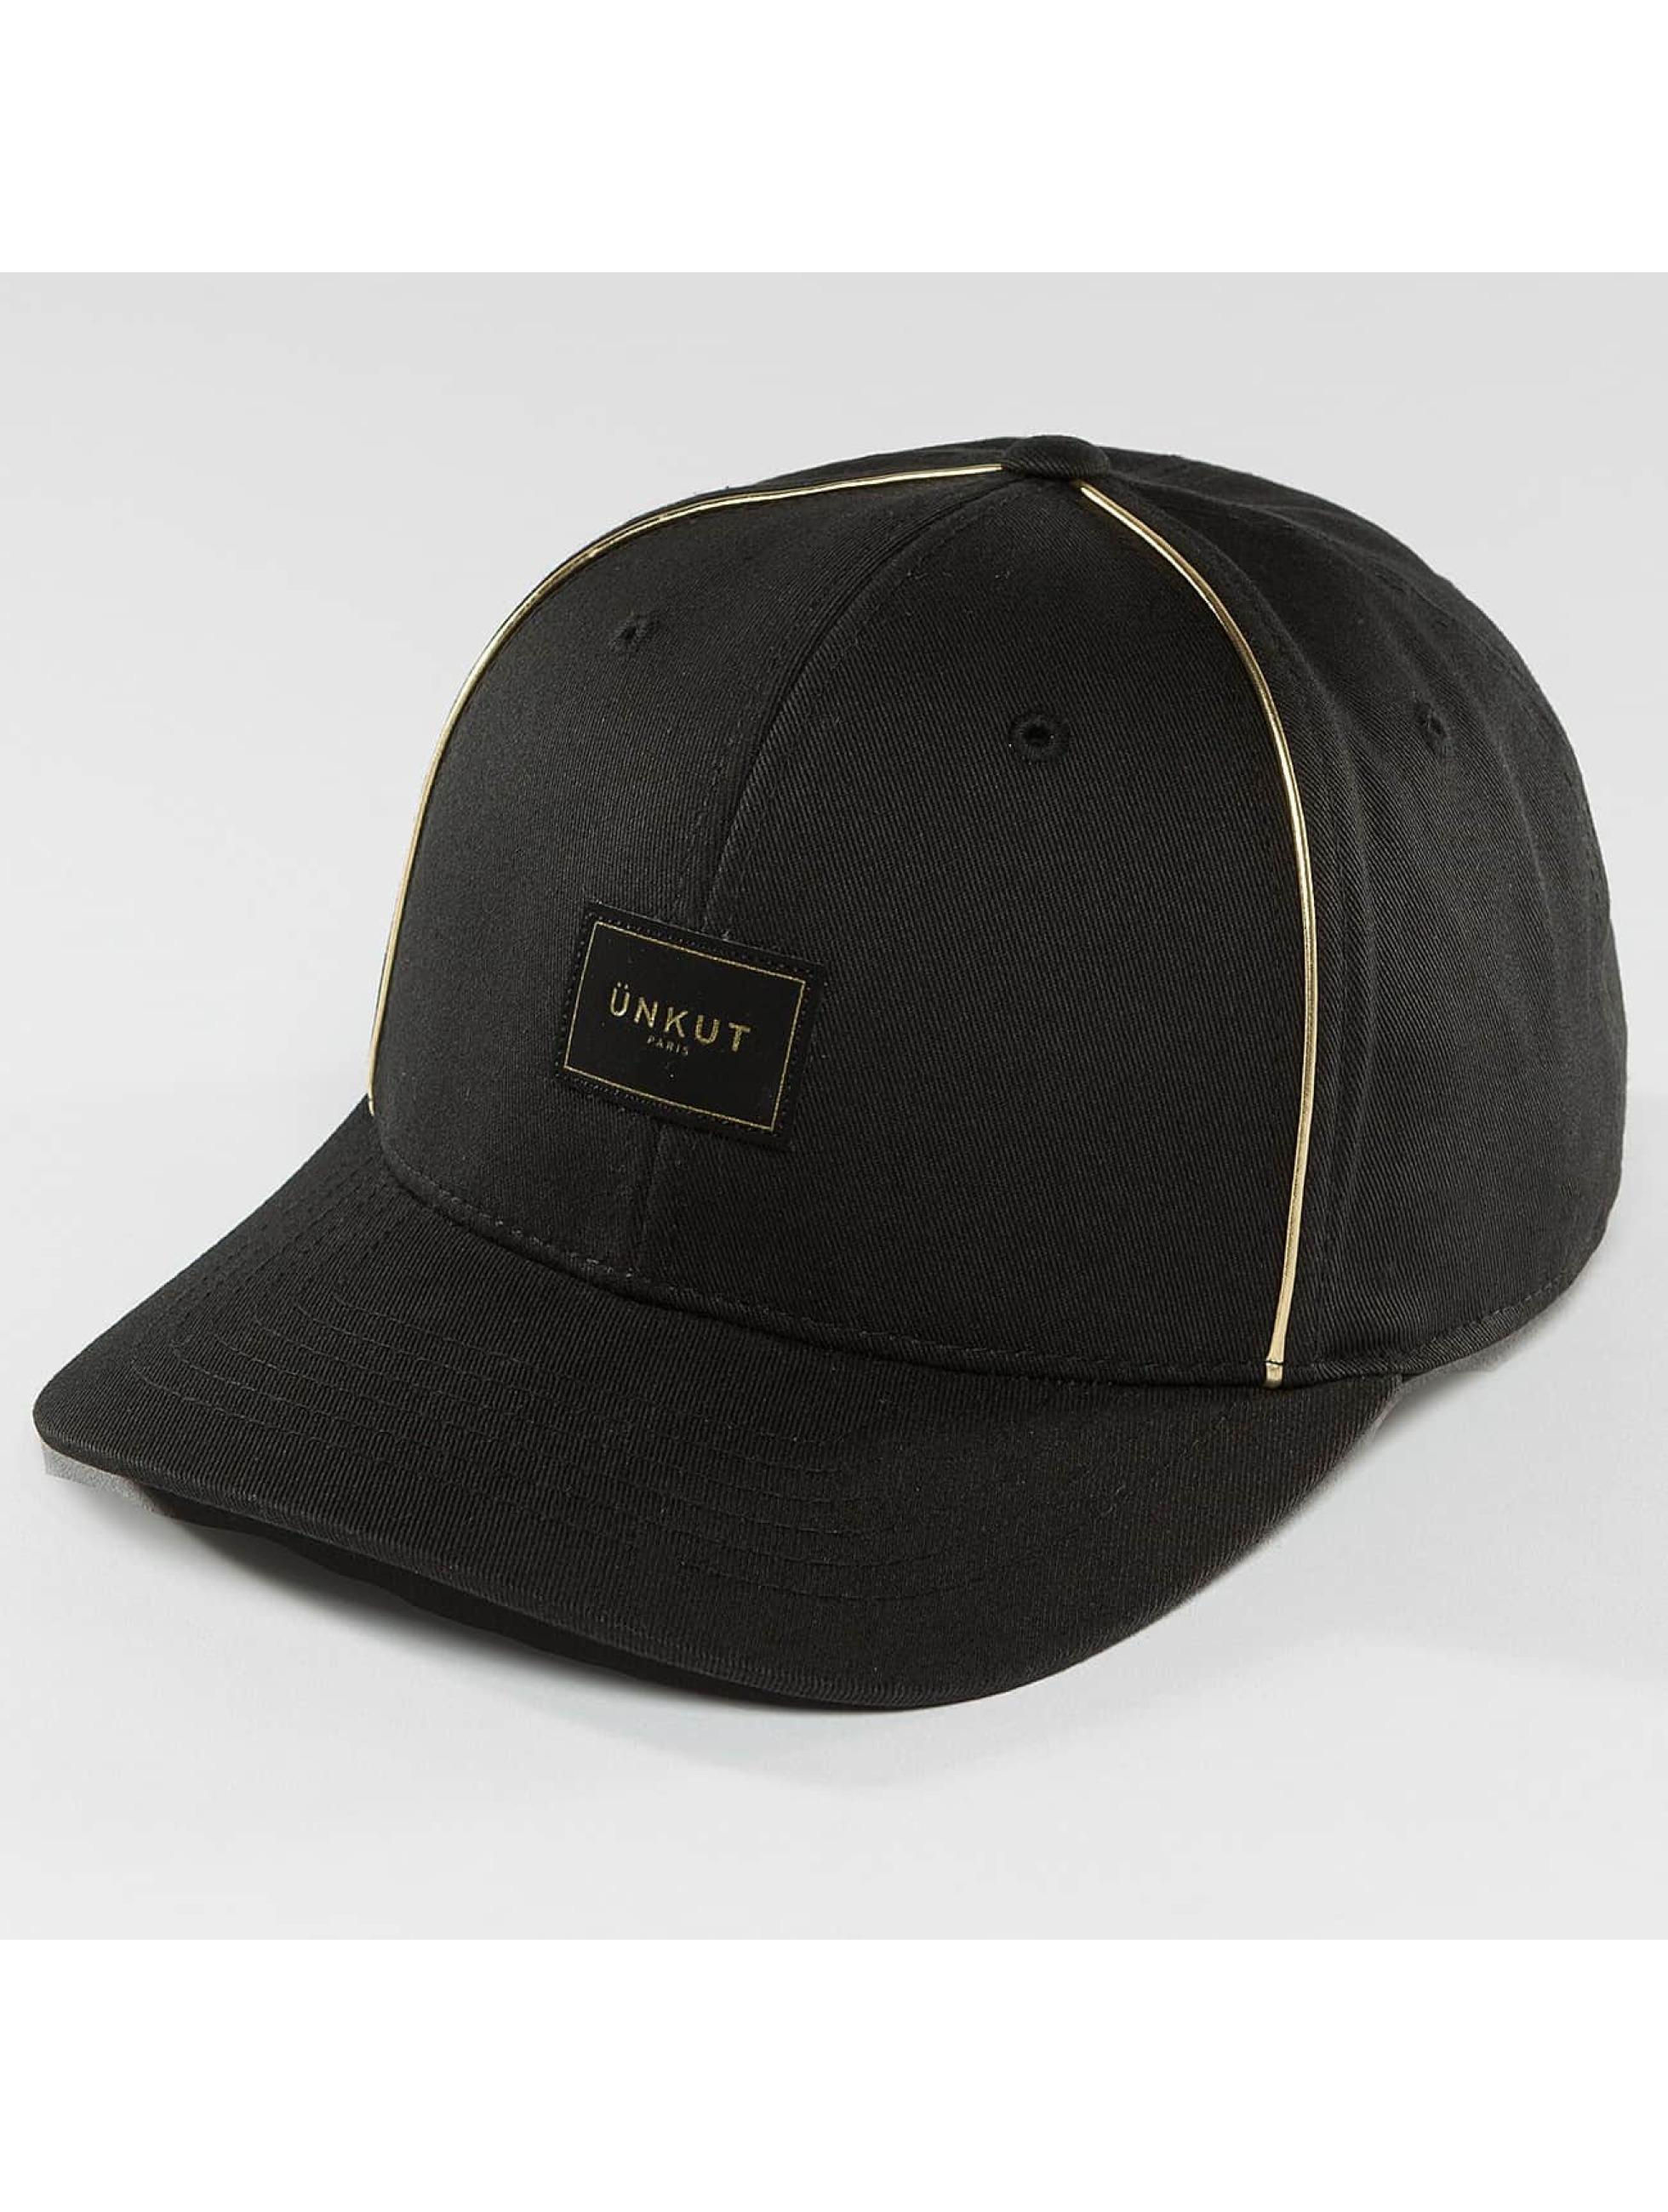 Unkut Männer,Frauen Snapback Cap Dallas in schwarz